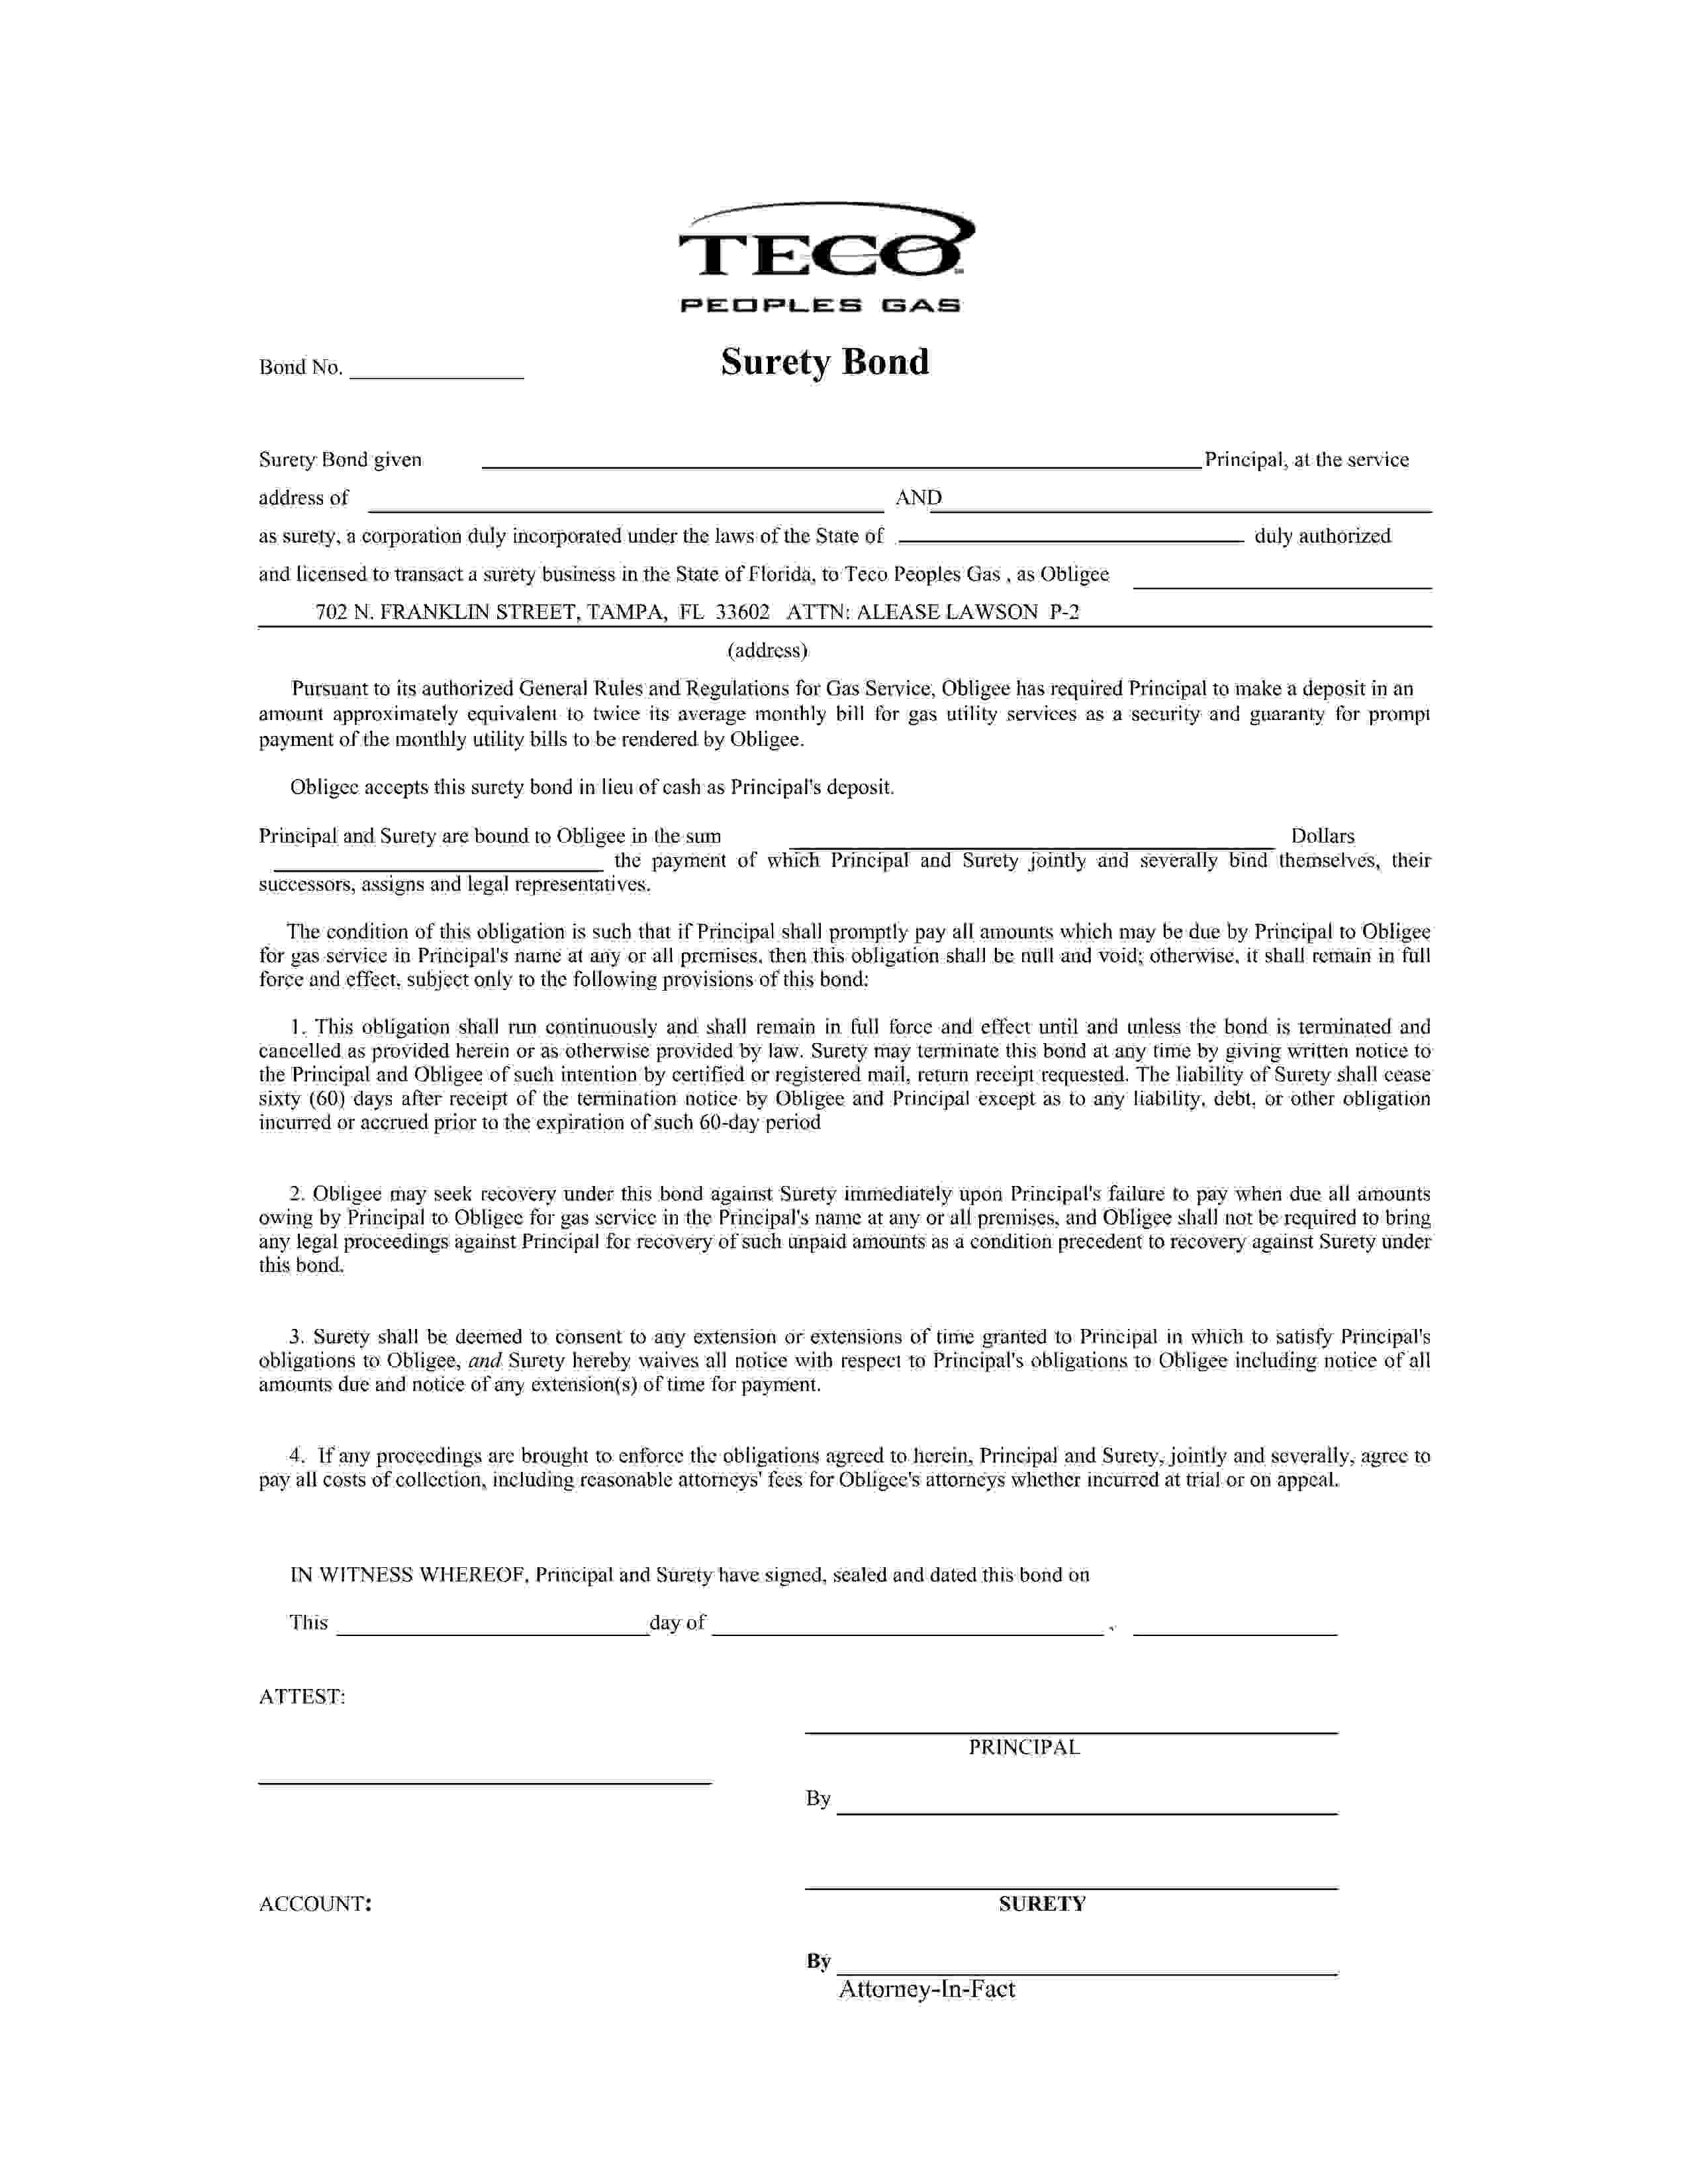 Teco Peoples Gas TECO Peoples Gas System Inc Utility Deposit Bond sample image